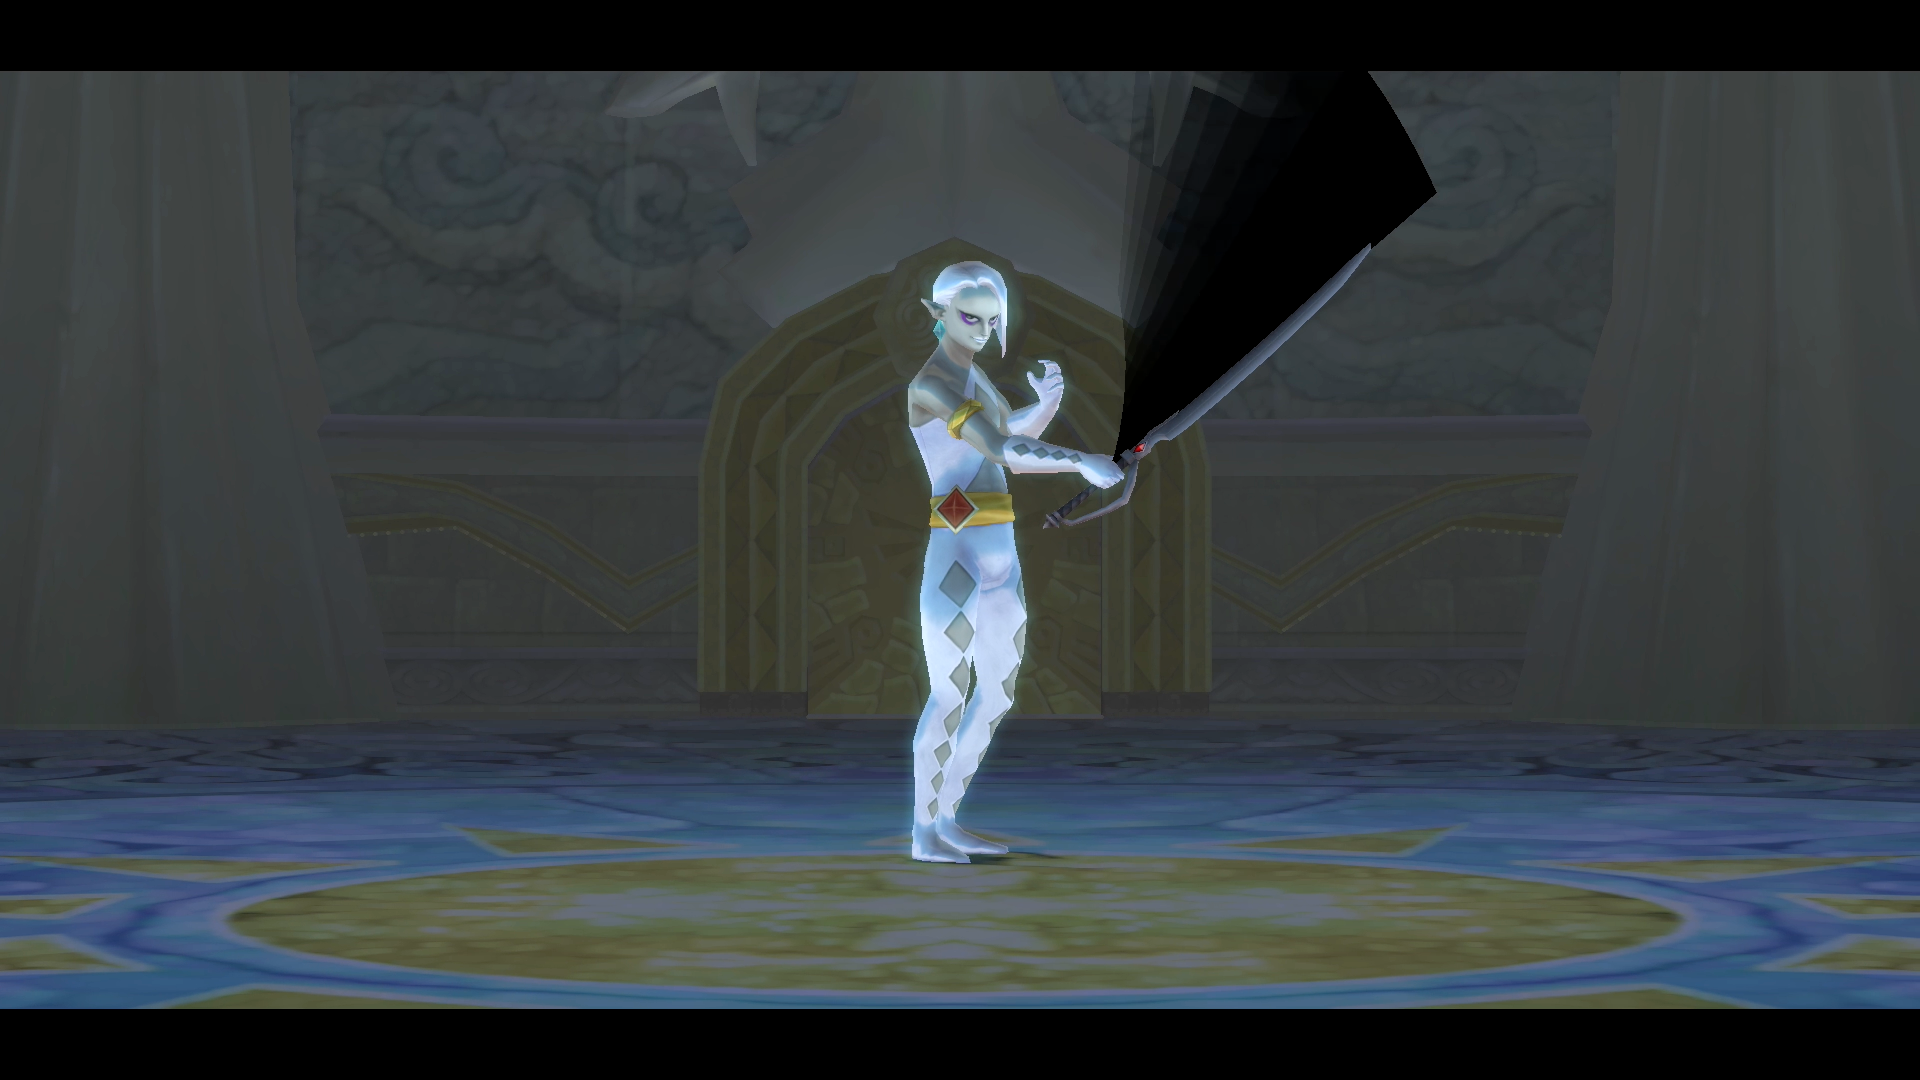 A boss battle with Demon Lord Ghirahim from The Legend of Zelda: Skyward Sword